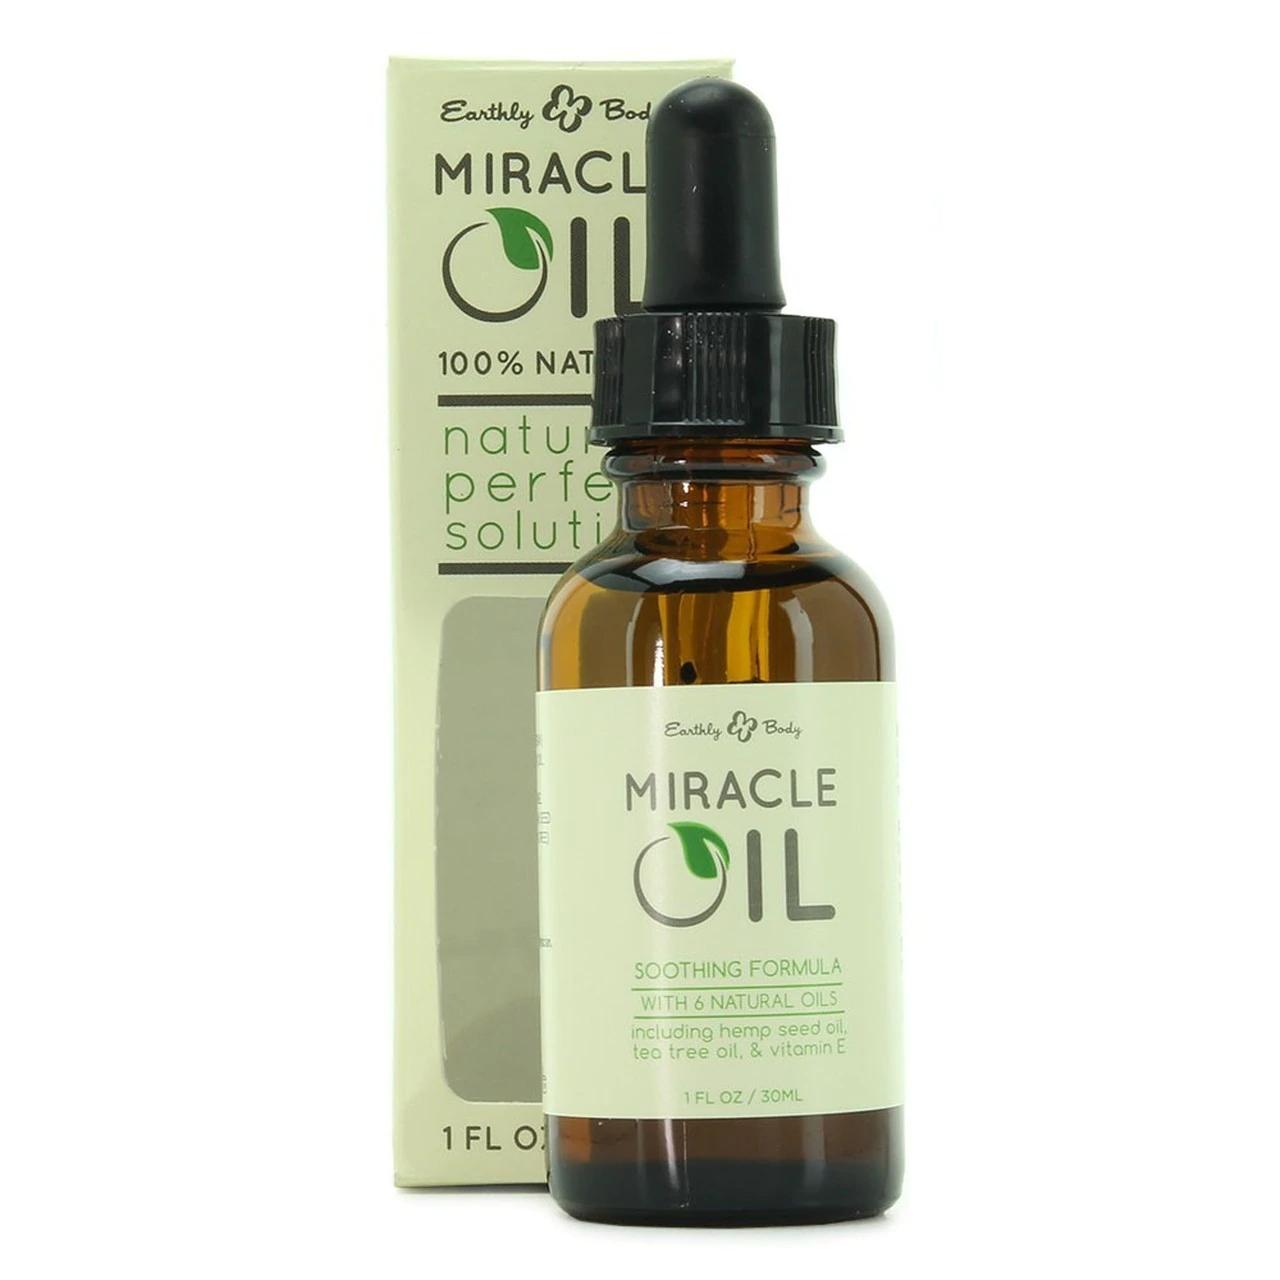 Earthly Body Earthly Body - Miracle Oil 1oz